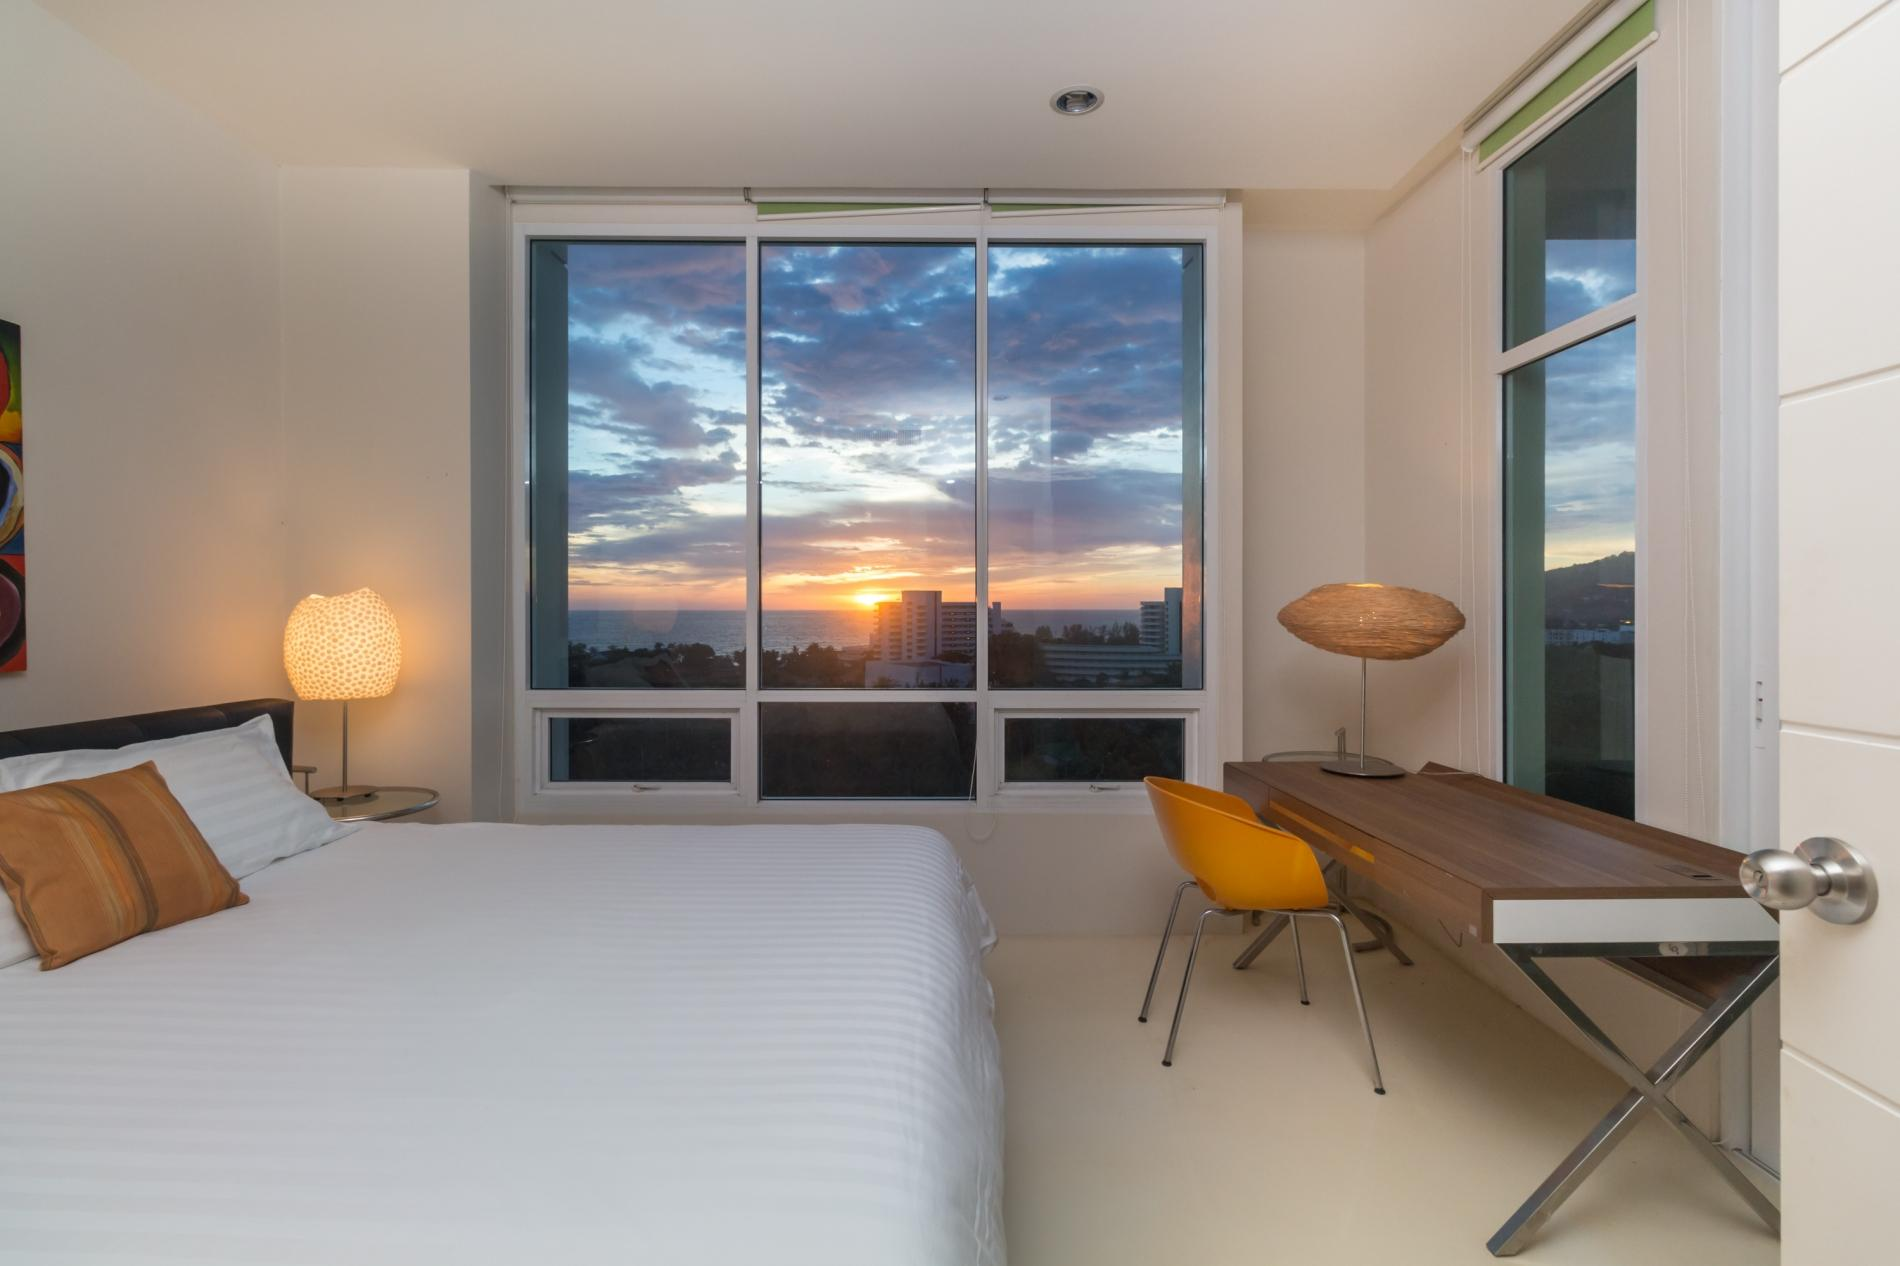 Apartment KH2605 - Sea-view Penthouse in Karon  walk to beach  restaurants  bars  shops photo 20125576